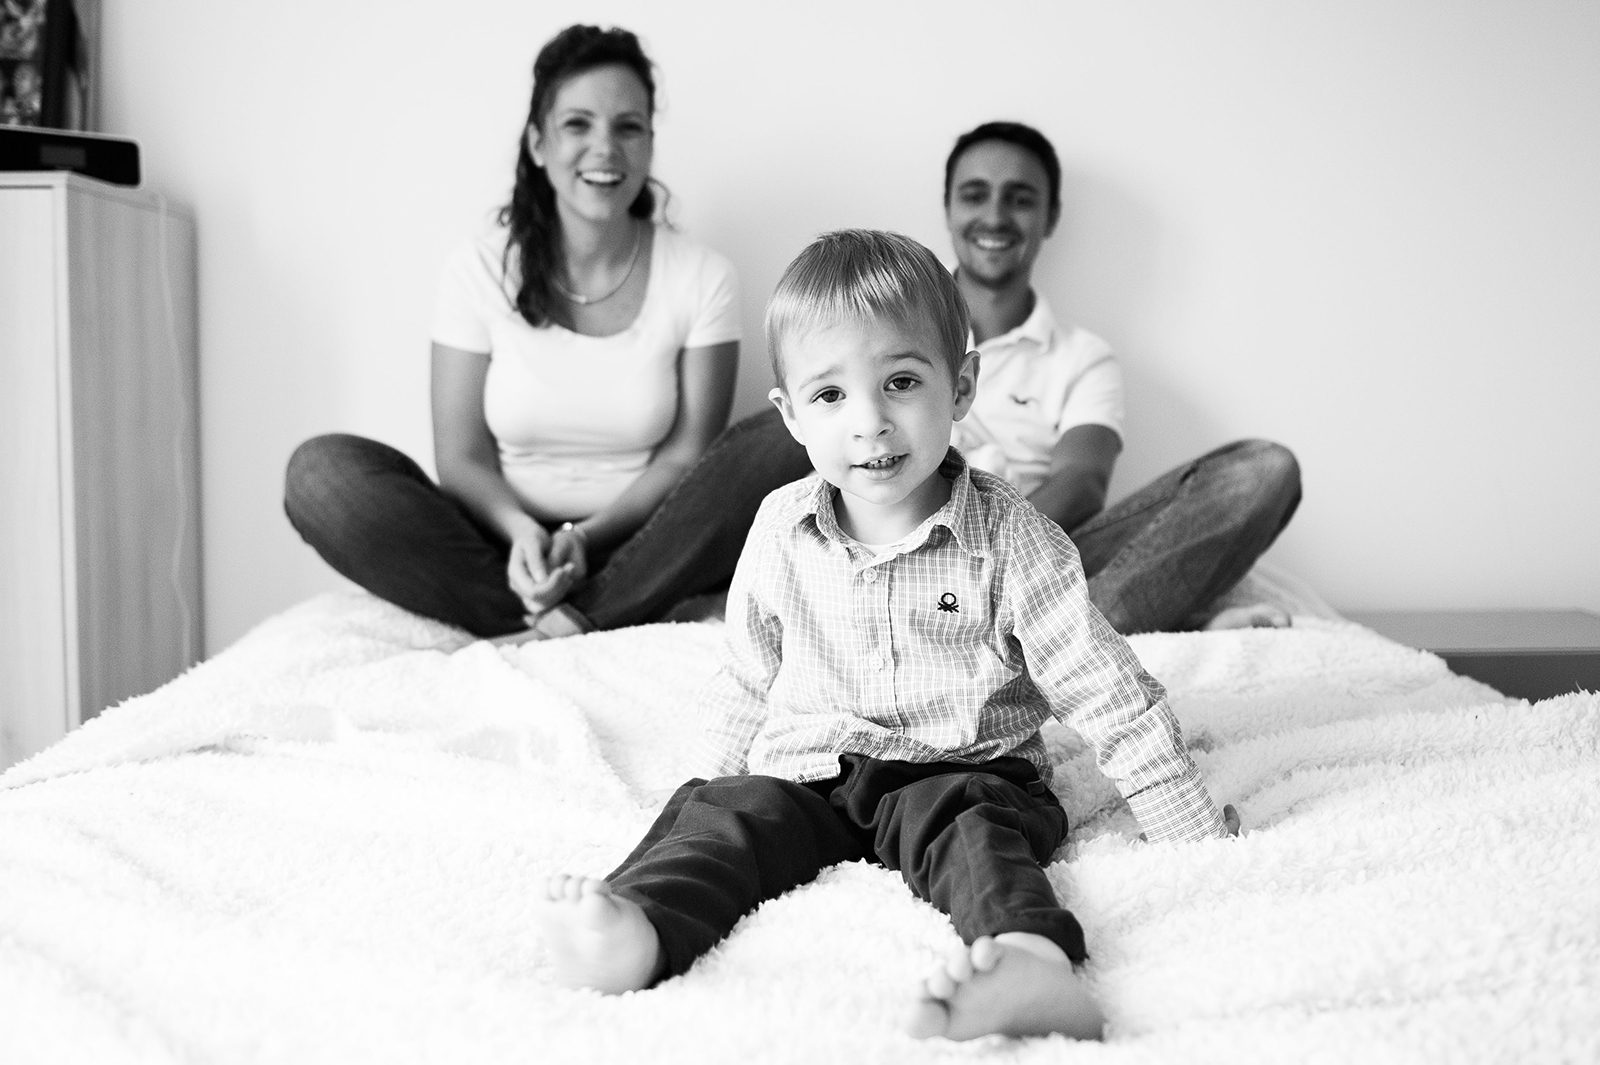 seance-photo-famille-photo-grossesse-photo-bébé-naissance-sabrina-godemert-photographe-seine-et-marne029